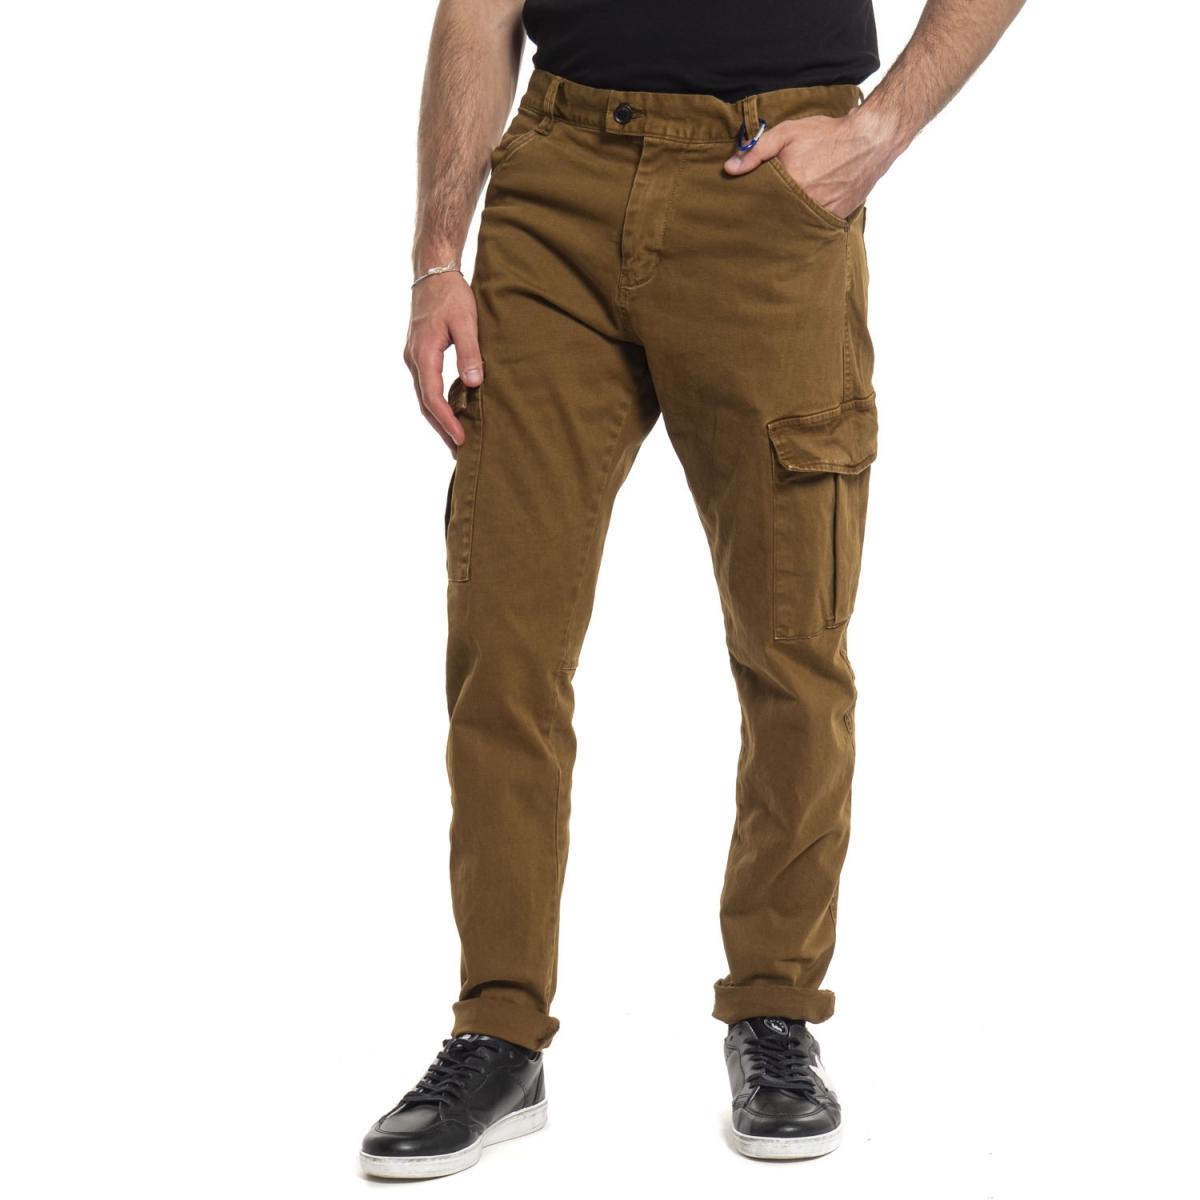 clothing Pants men Pantalone LPP0008 LANDEK PARK Cafedelmar Shop